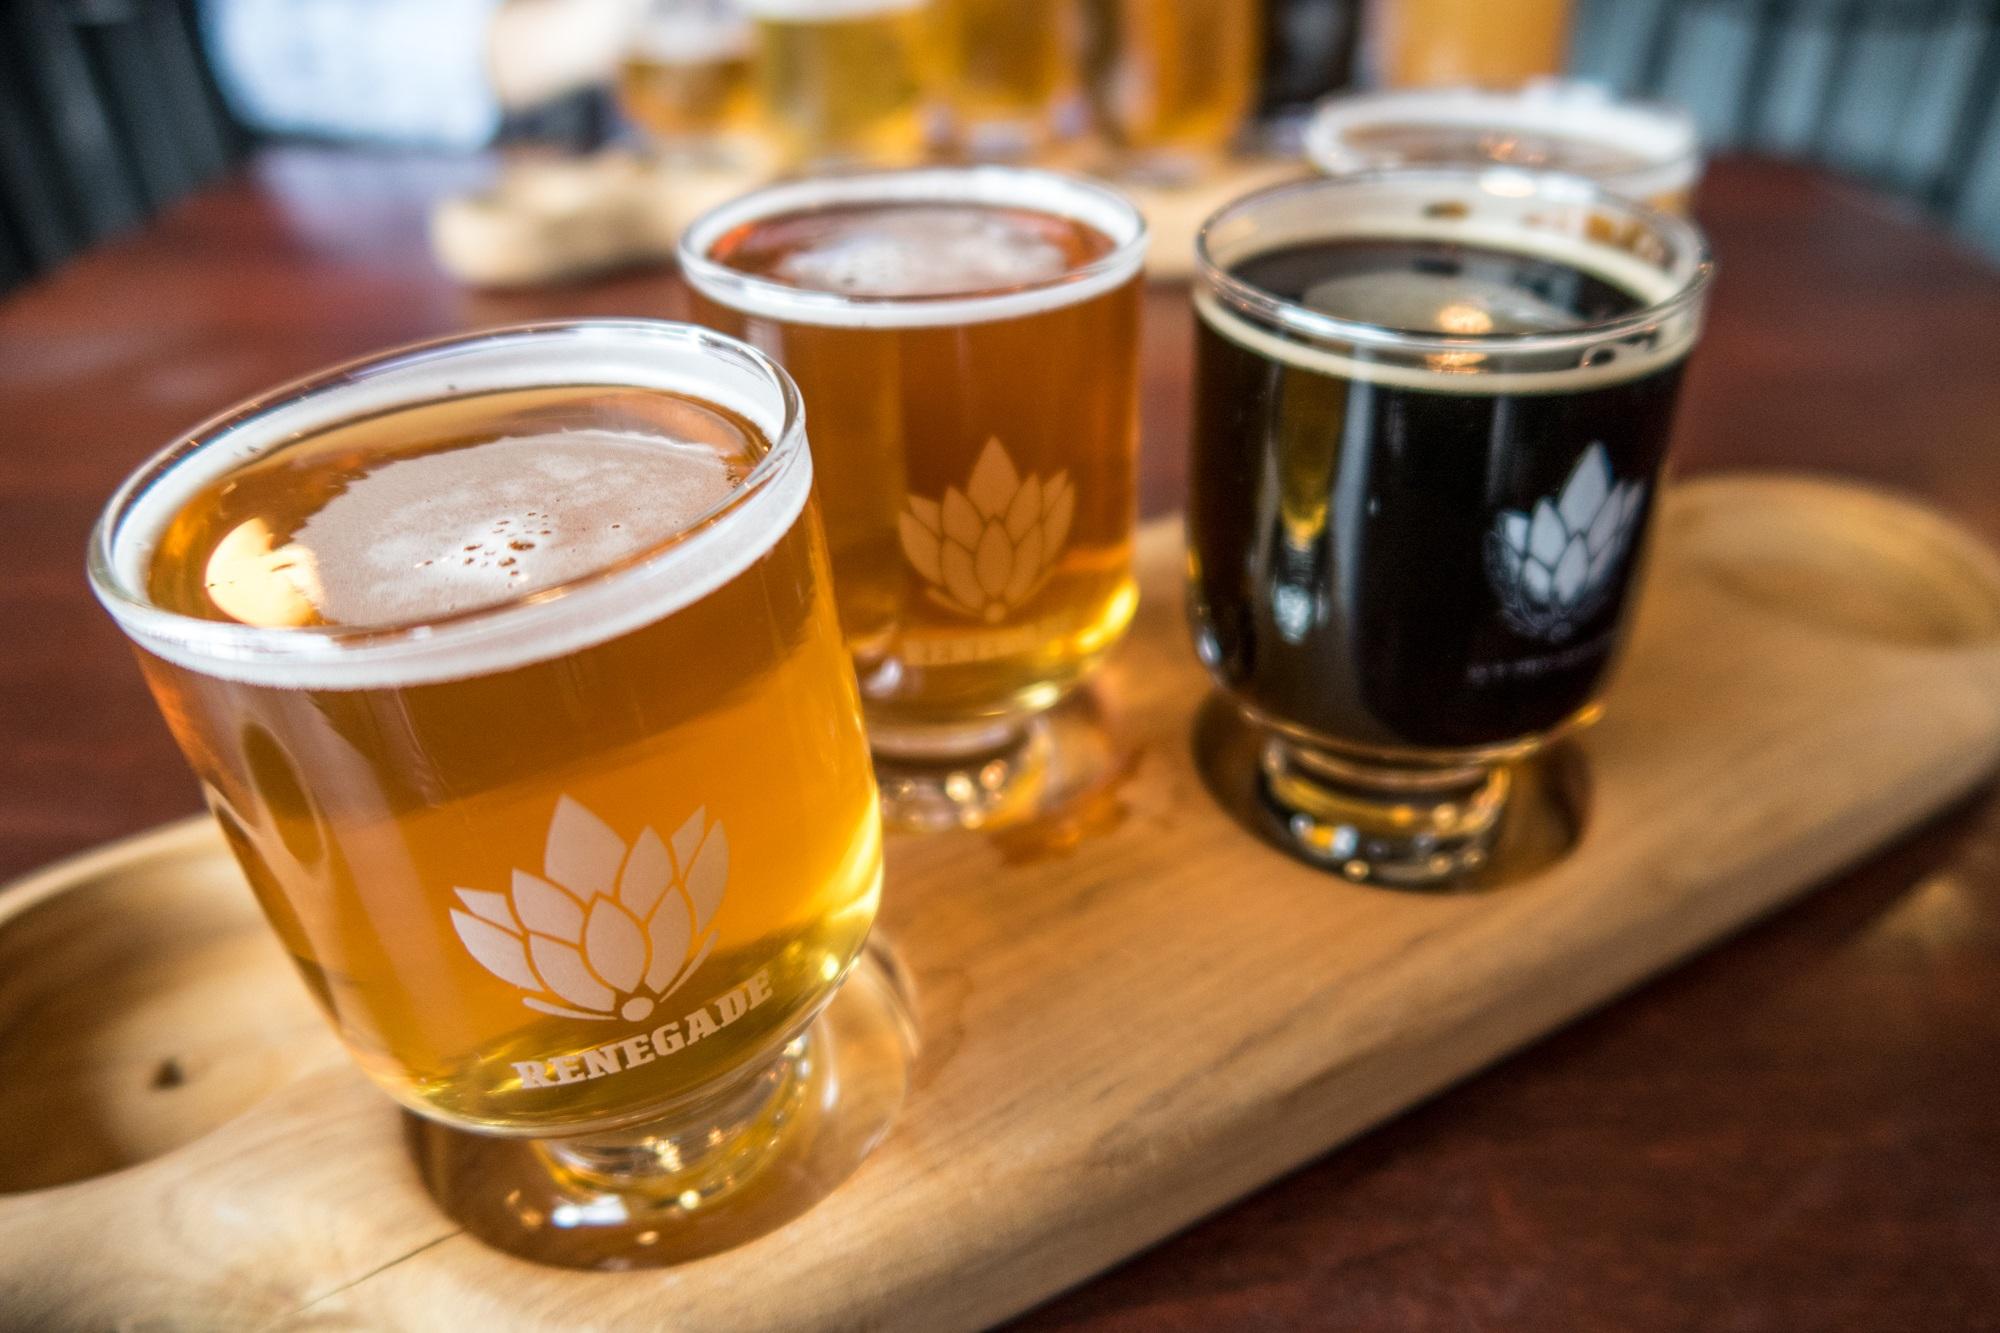 Renegade Brewery